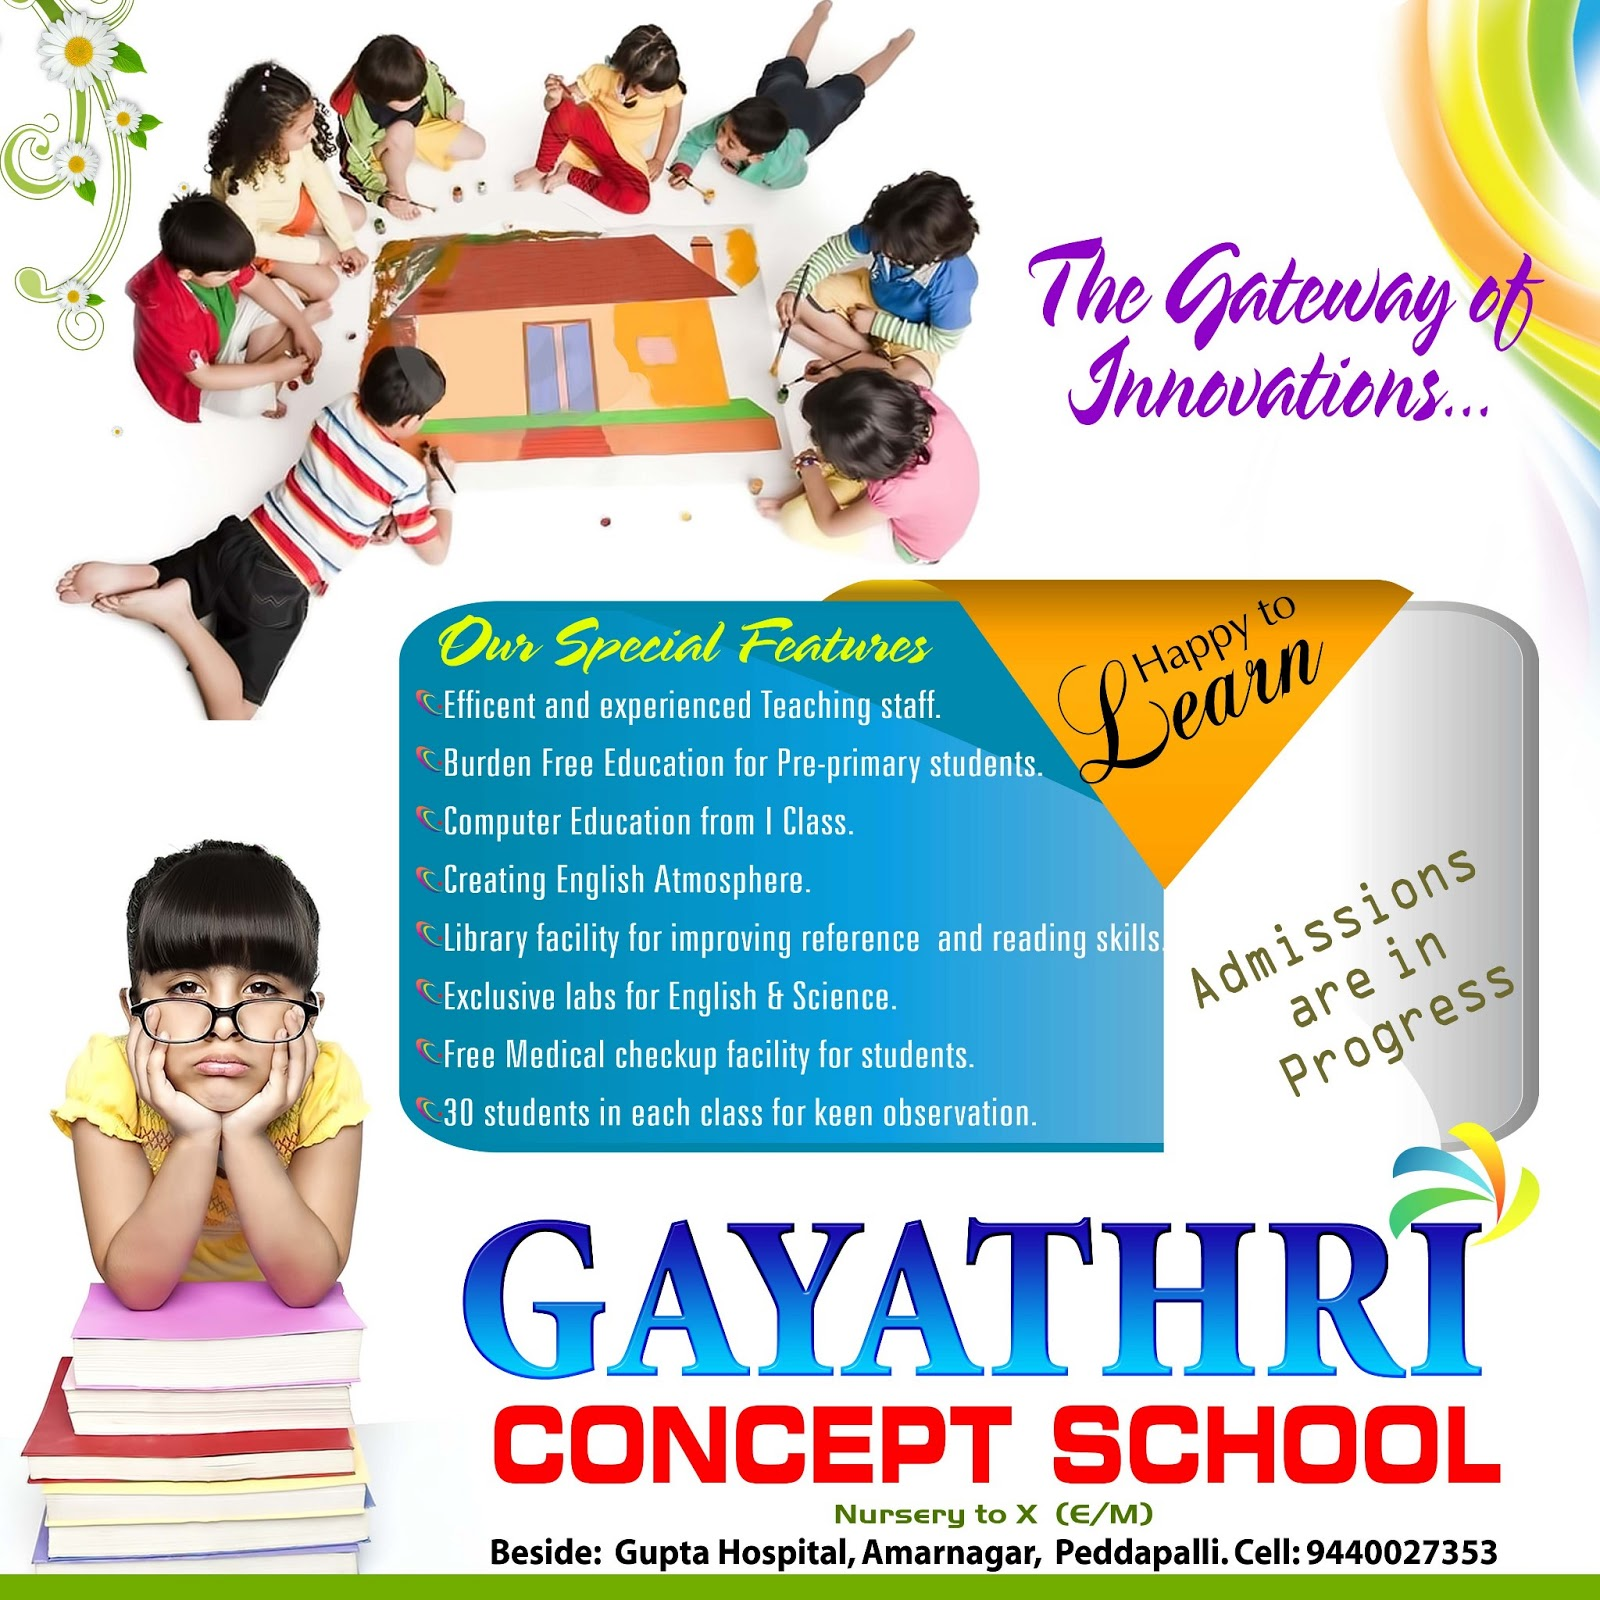 gayatri concept school banner designs  naveengfx